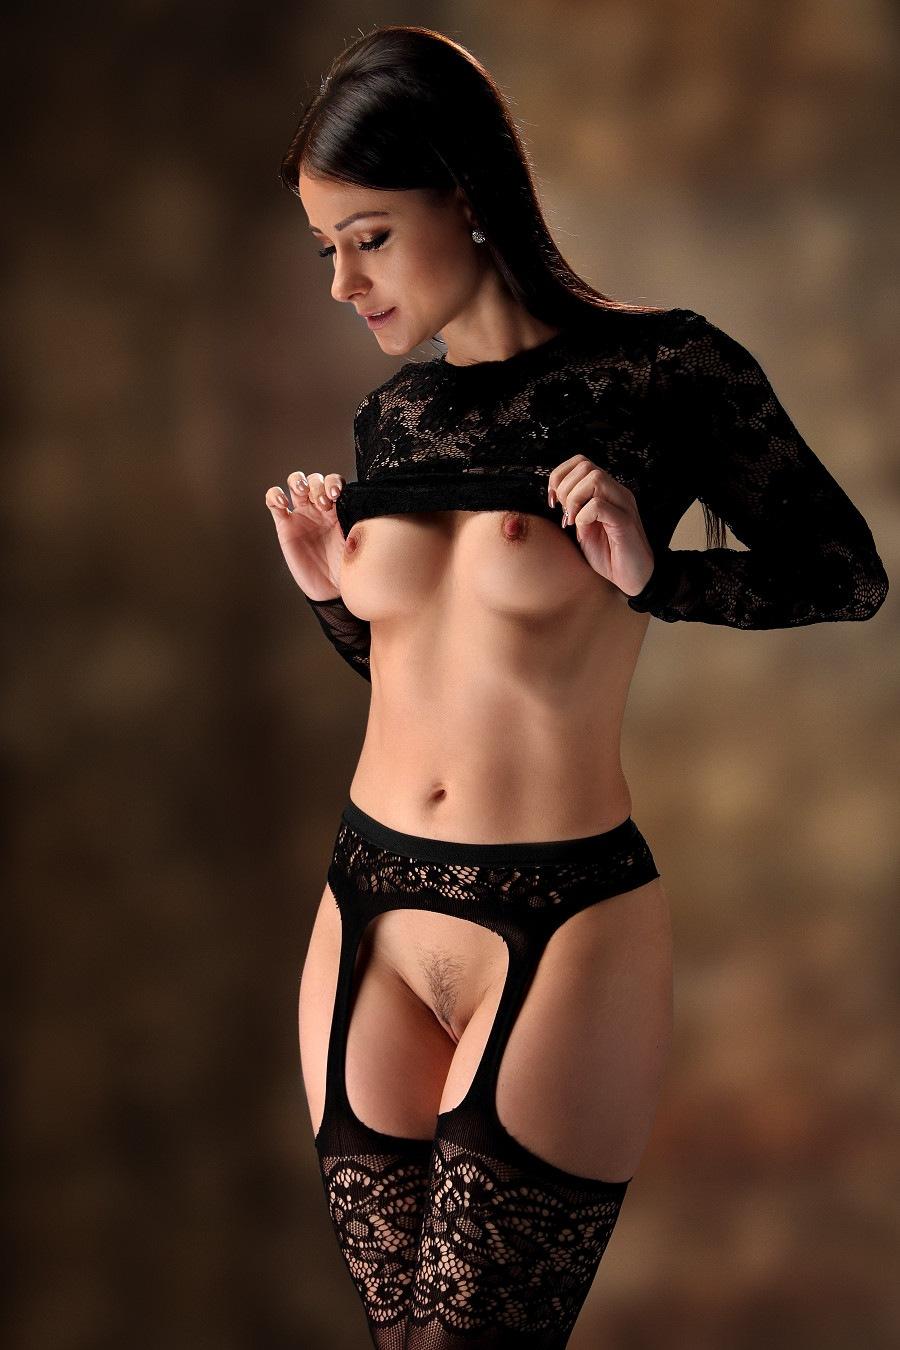 Nude in black lingerie by GuWu